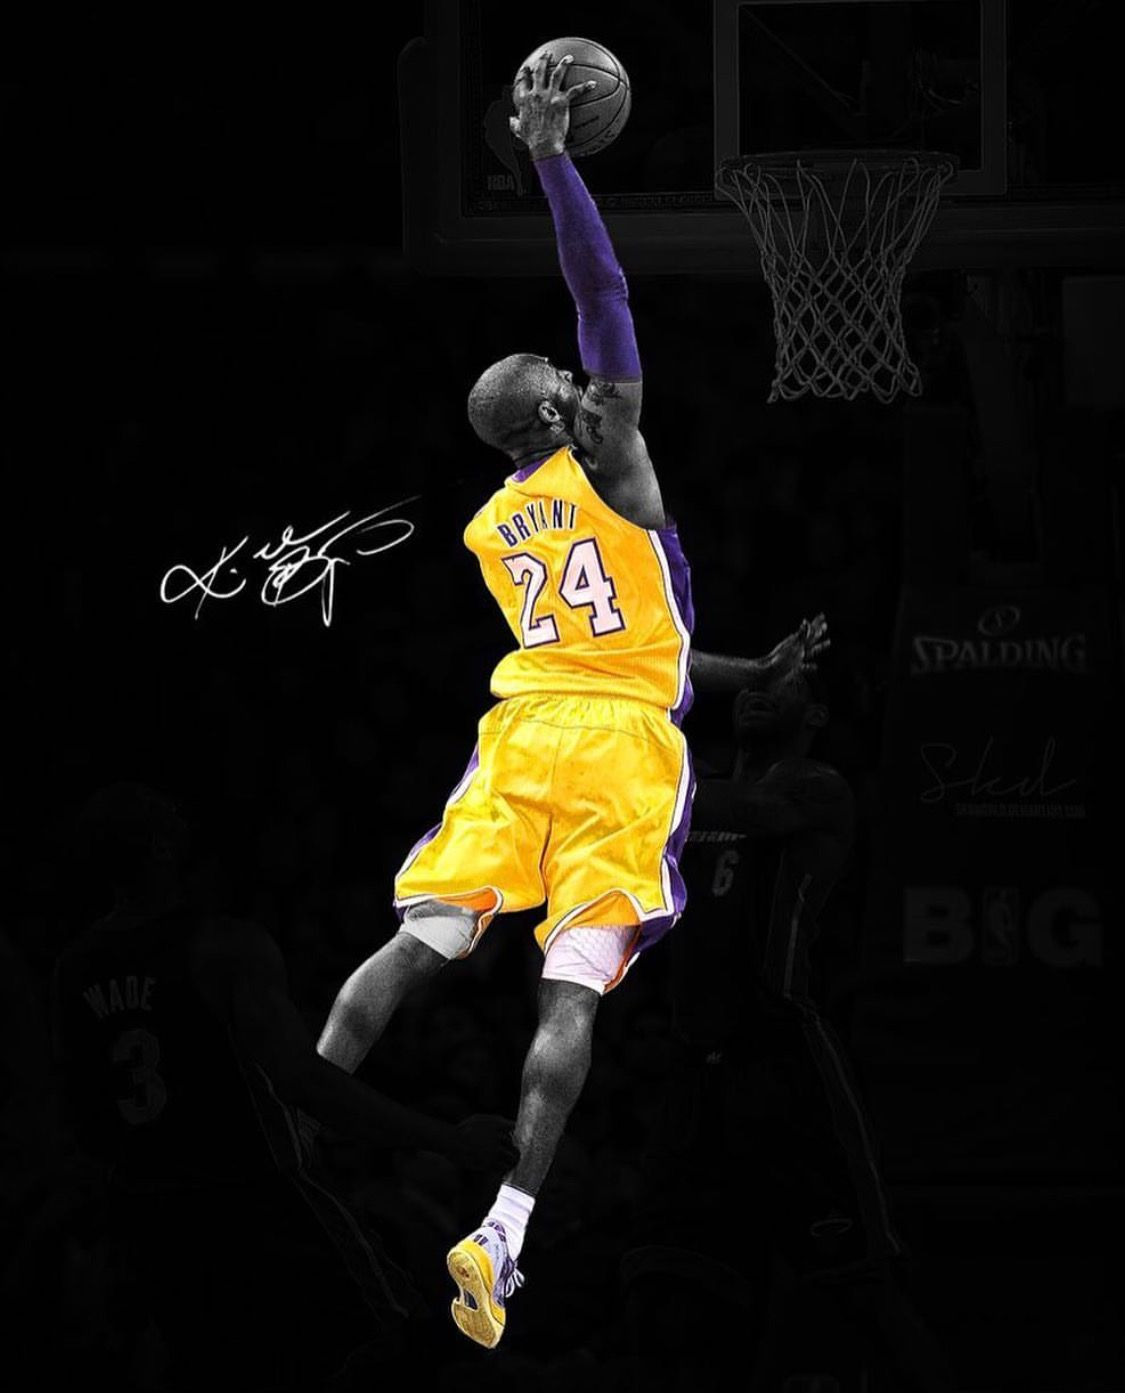 Pin By Ricardo Cambronero On Lakers Baby Kobe Bryant Dunk Kobe Bryant Wallpaper Kobe Bryant Poster